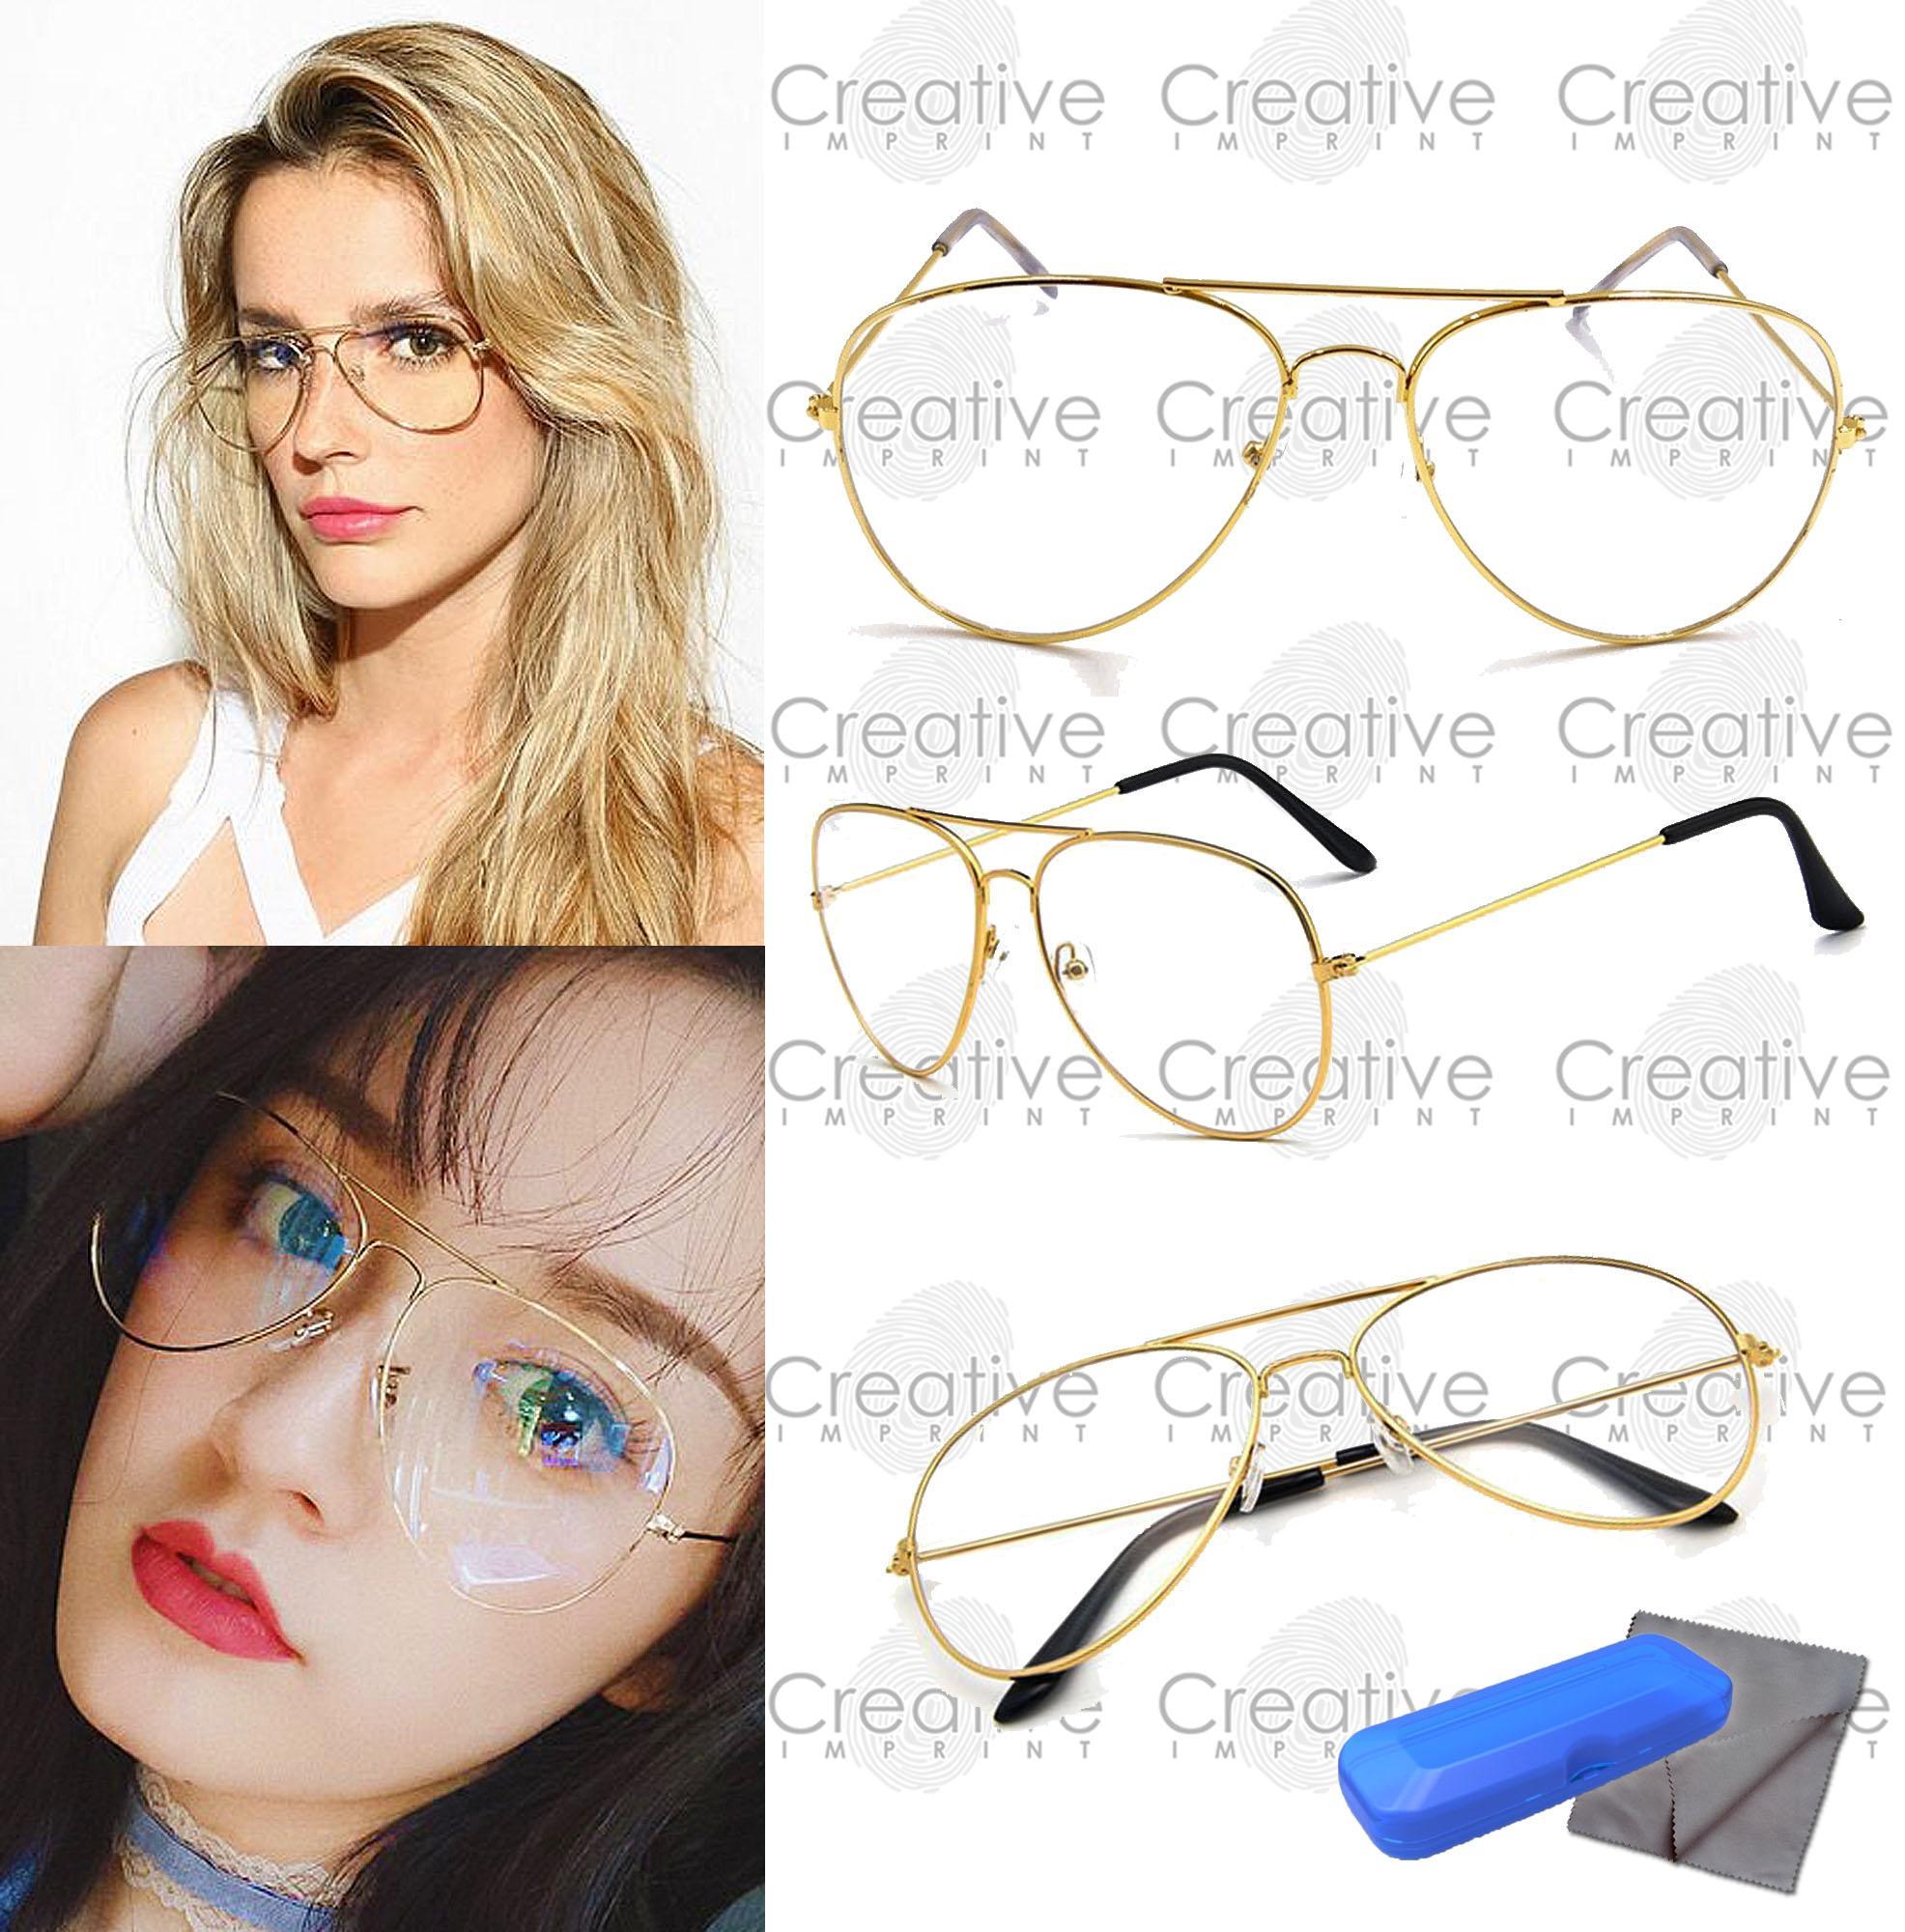 cd290bf7fd1 Creative Imprint Aviator Teardrop Pilot Specs (Clear Lens Gold Frame) Sunnies  Trendy Fashion Eyeglasses